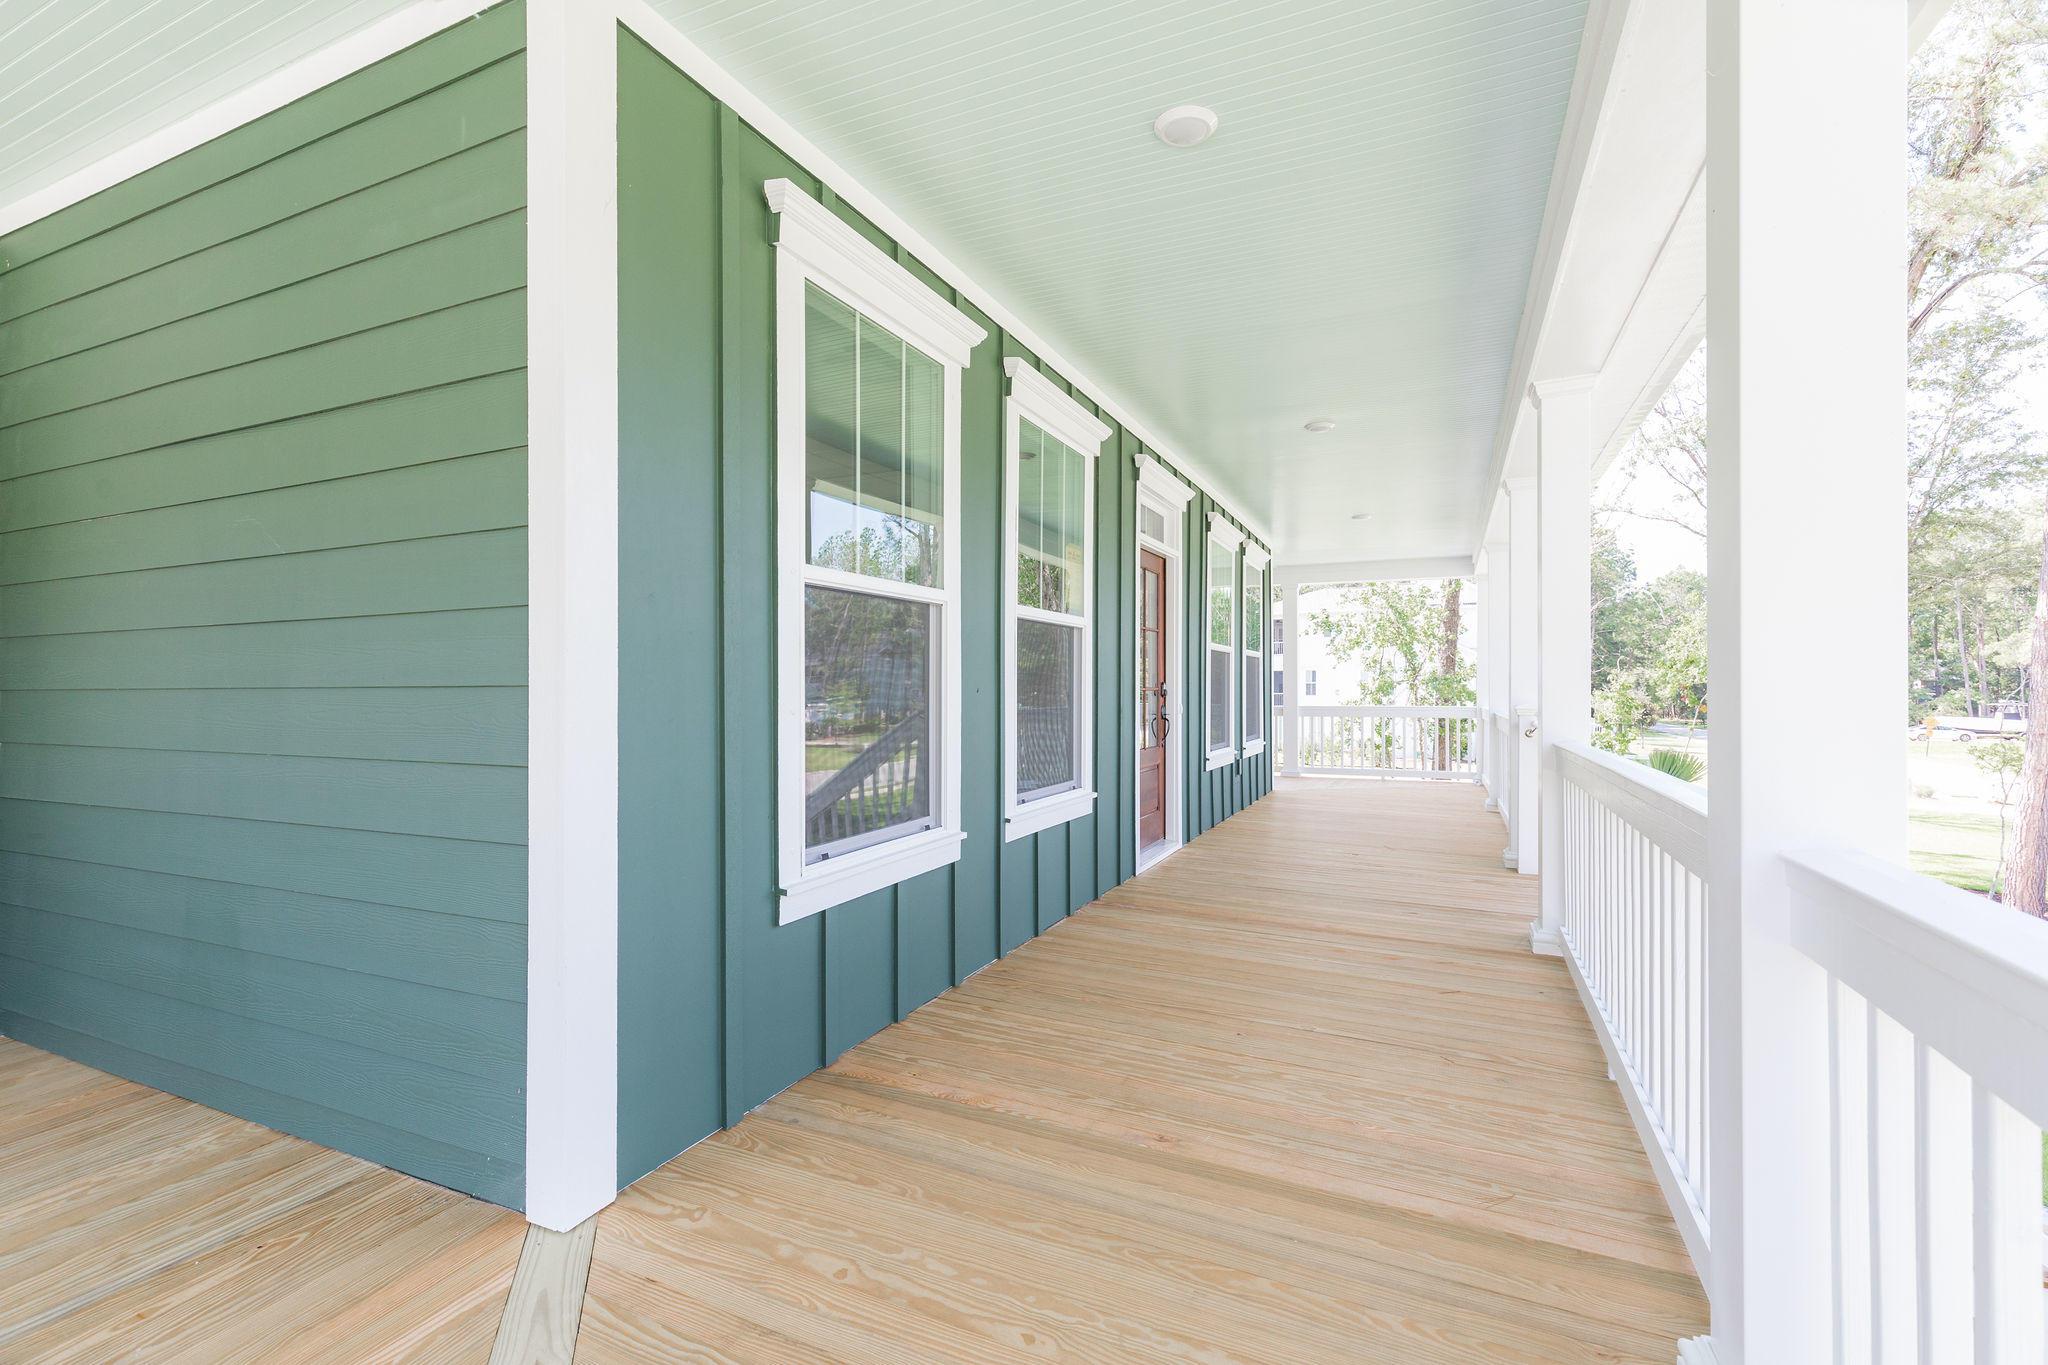 Rushland Plantation Homes For Sale - 2421 Rushland Landing, Johns Island, SC - 1